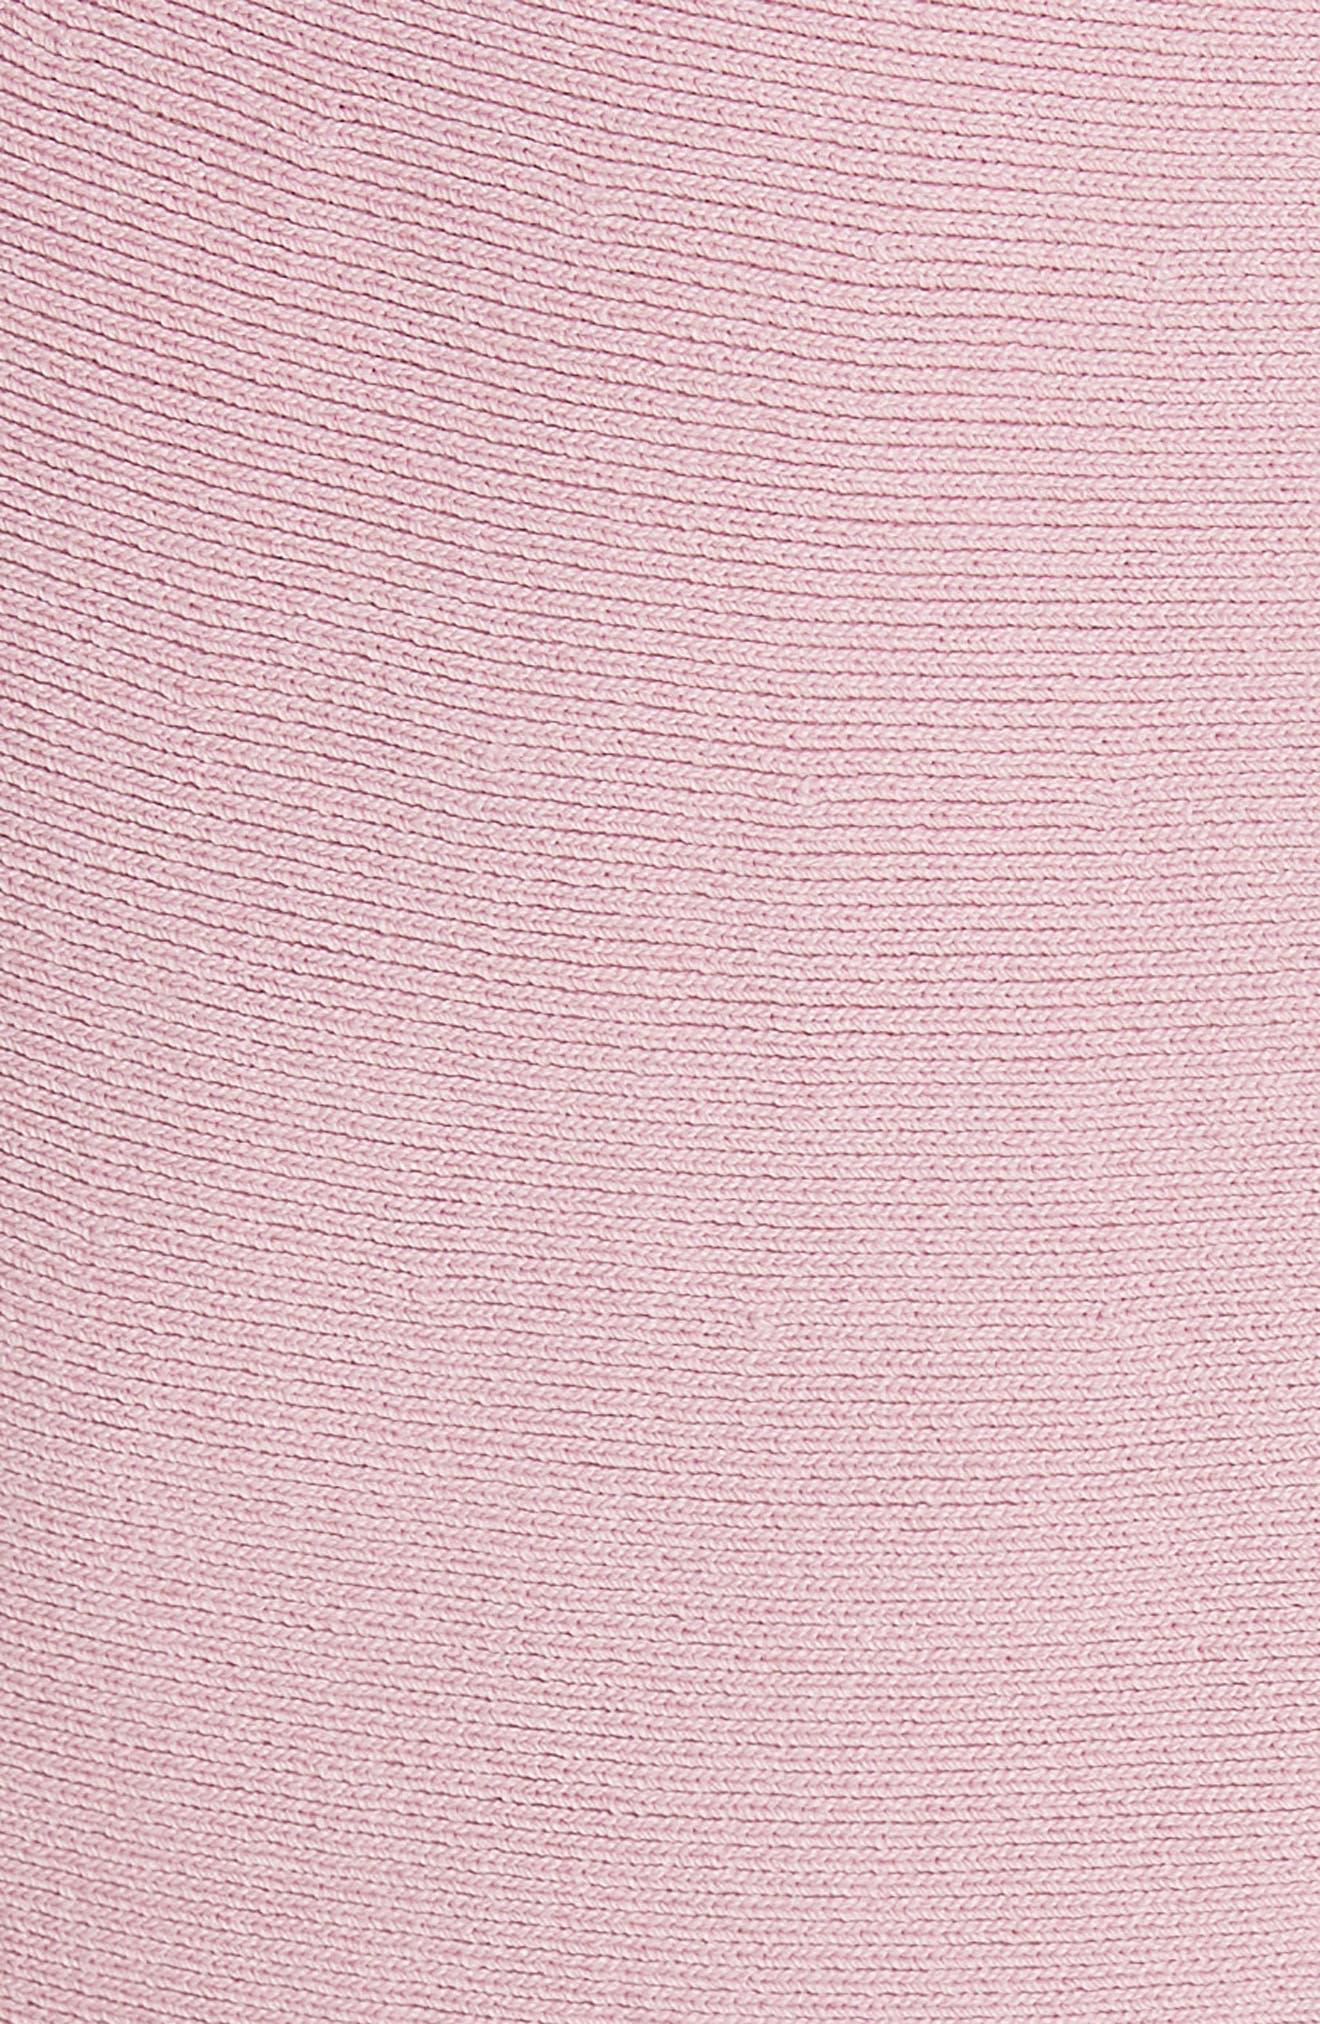 Bow Detail Knit Fit & Flare Dress,                             Alternate thumbnail 5, color,                             Dusky Pink